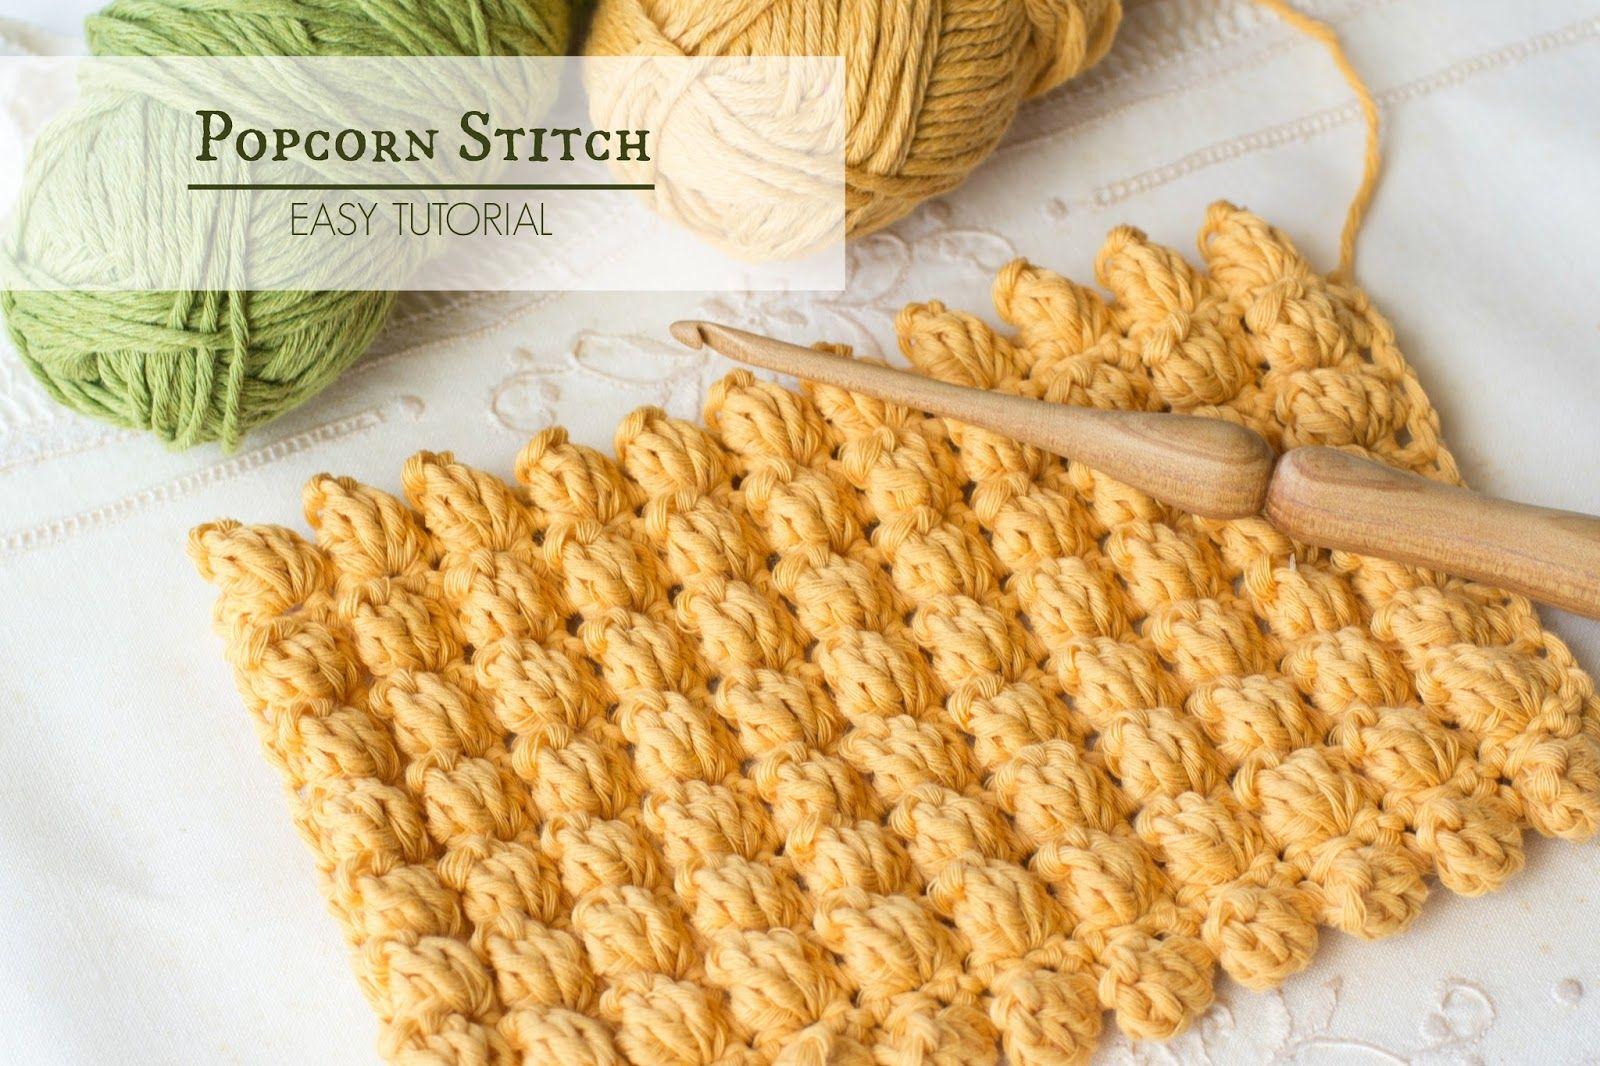 How To: Crochet The Popcorn Stitch - Easy Tutorial   Häckeln ...